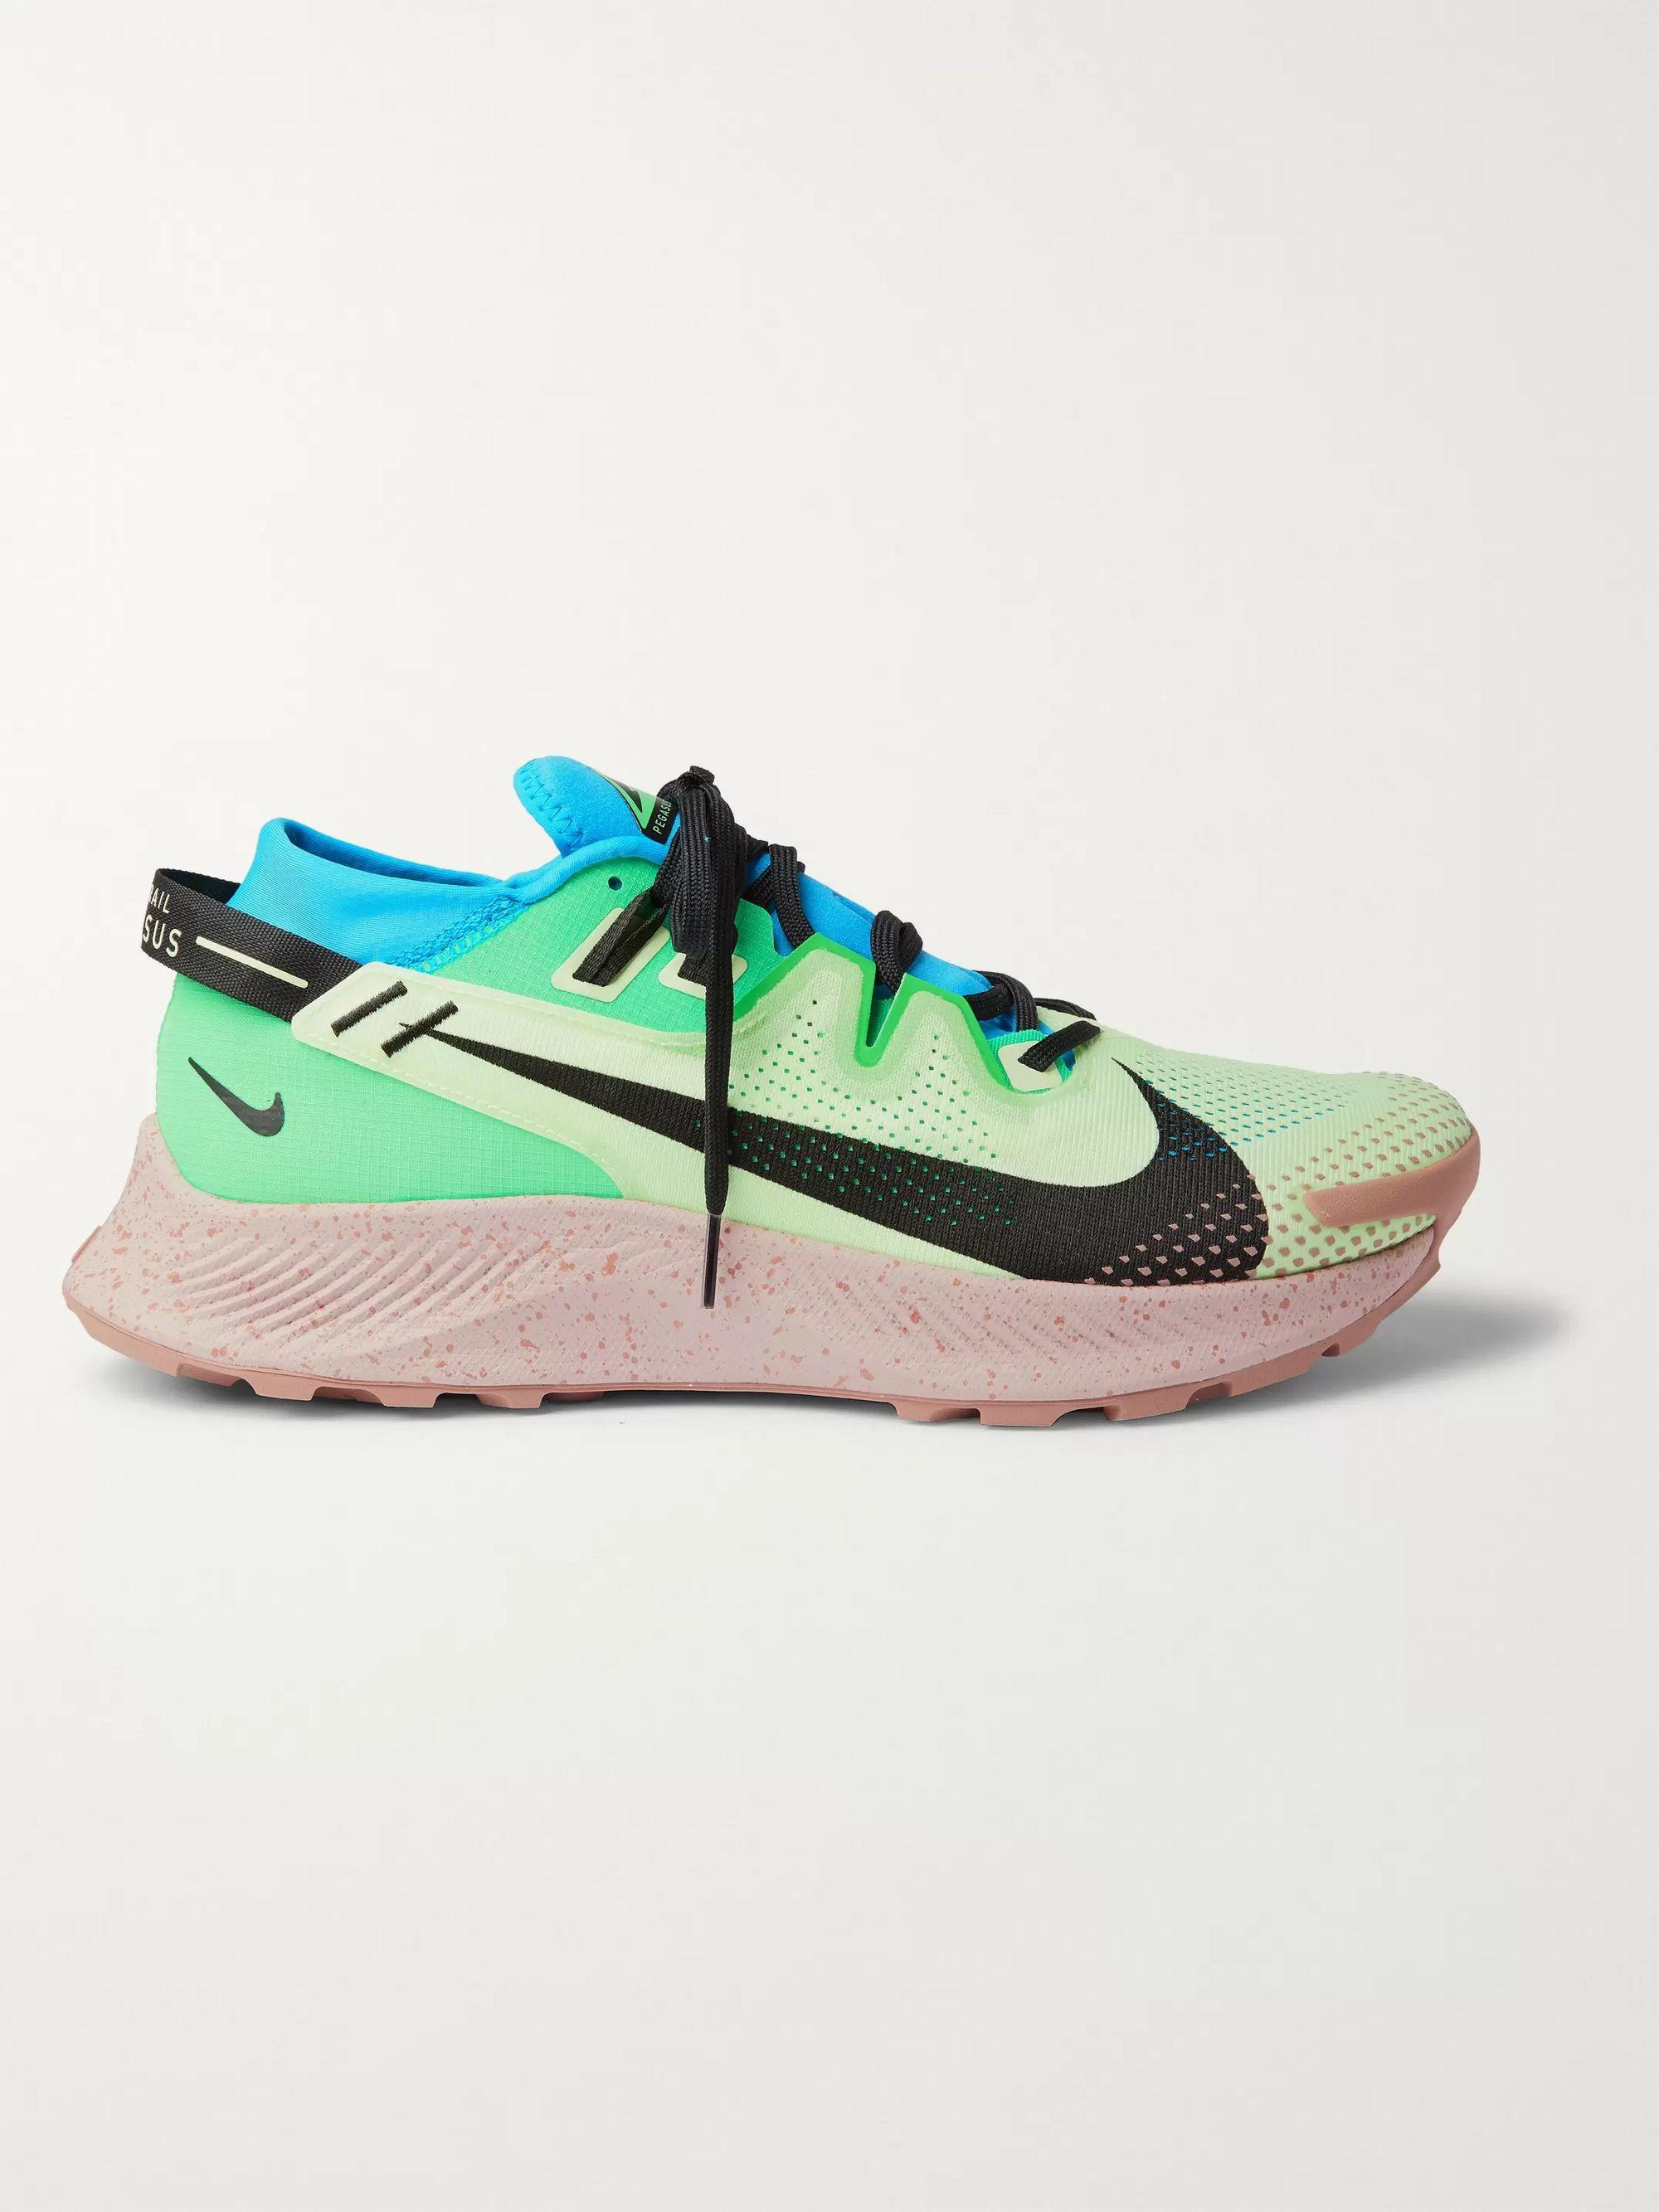 Neoprene Sneakers   Nike Running